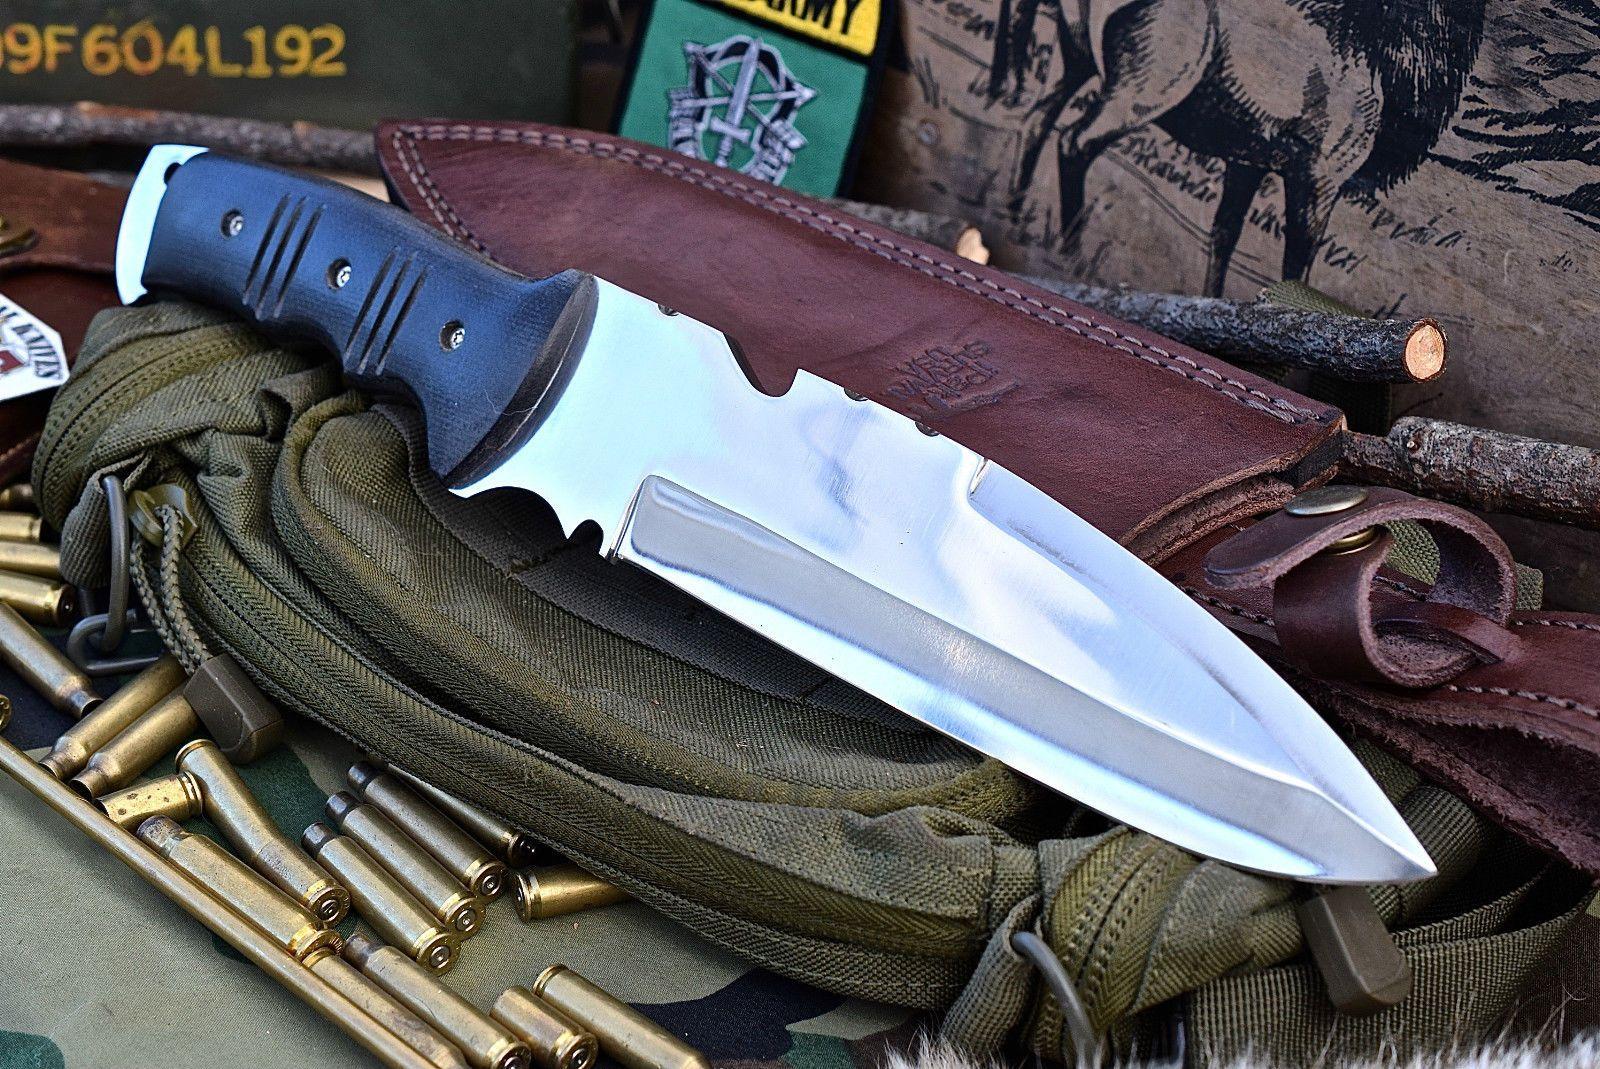 CFK USA Ipak Survival Custom Handmade D2 Large Ares God Bushman Camp EDC Knife | eBay